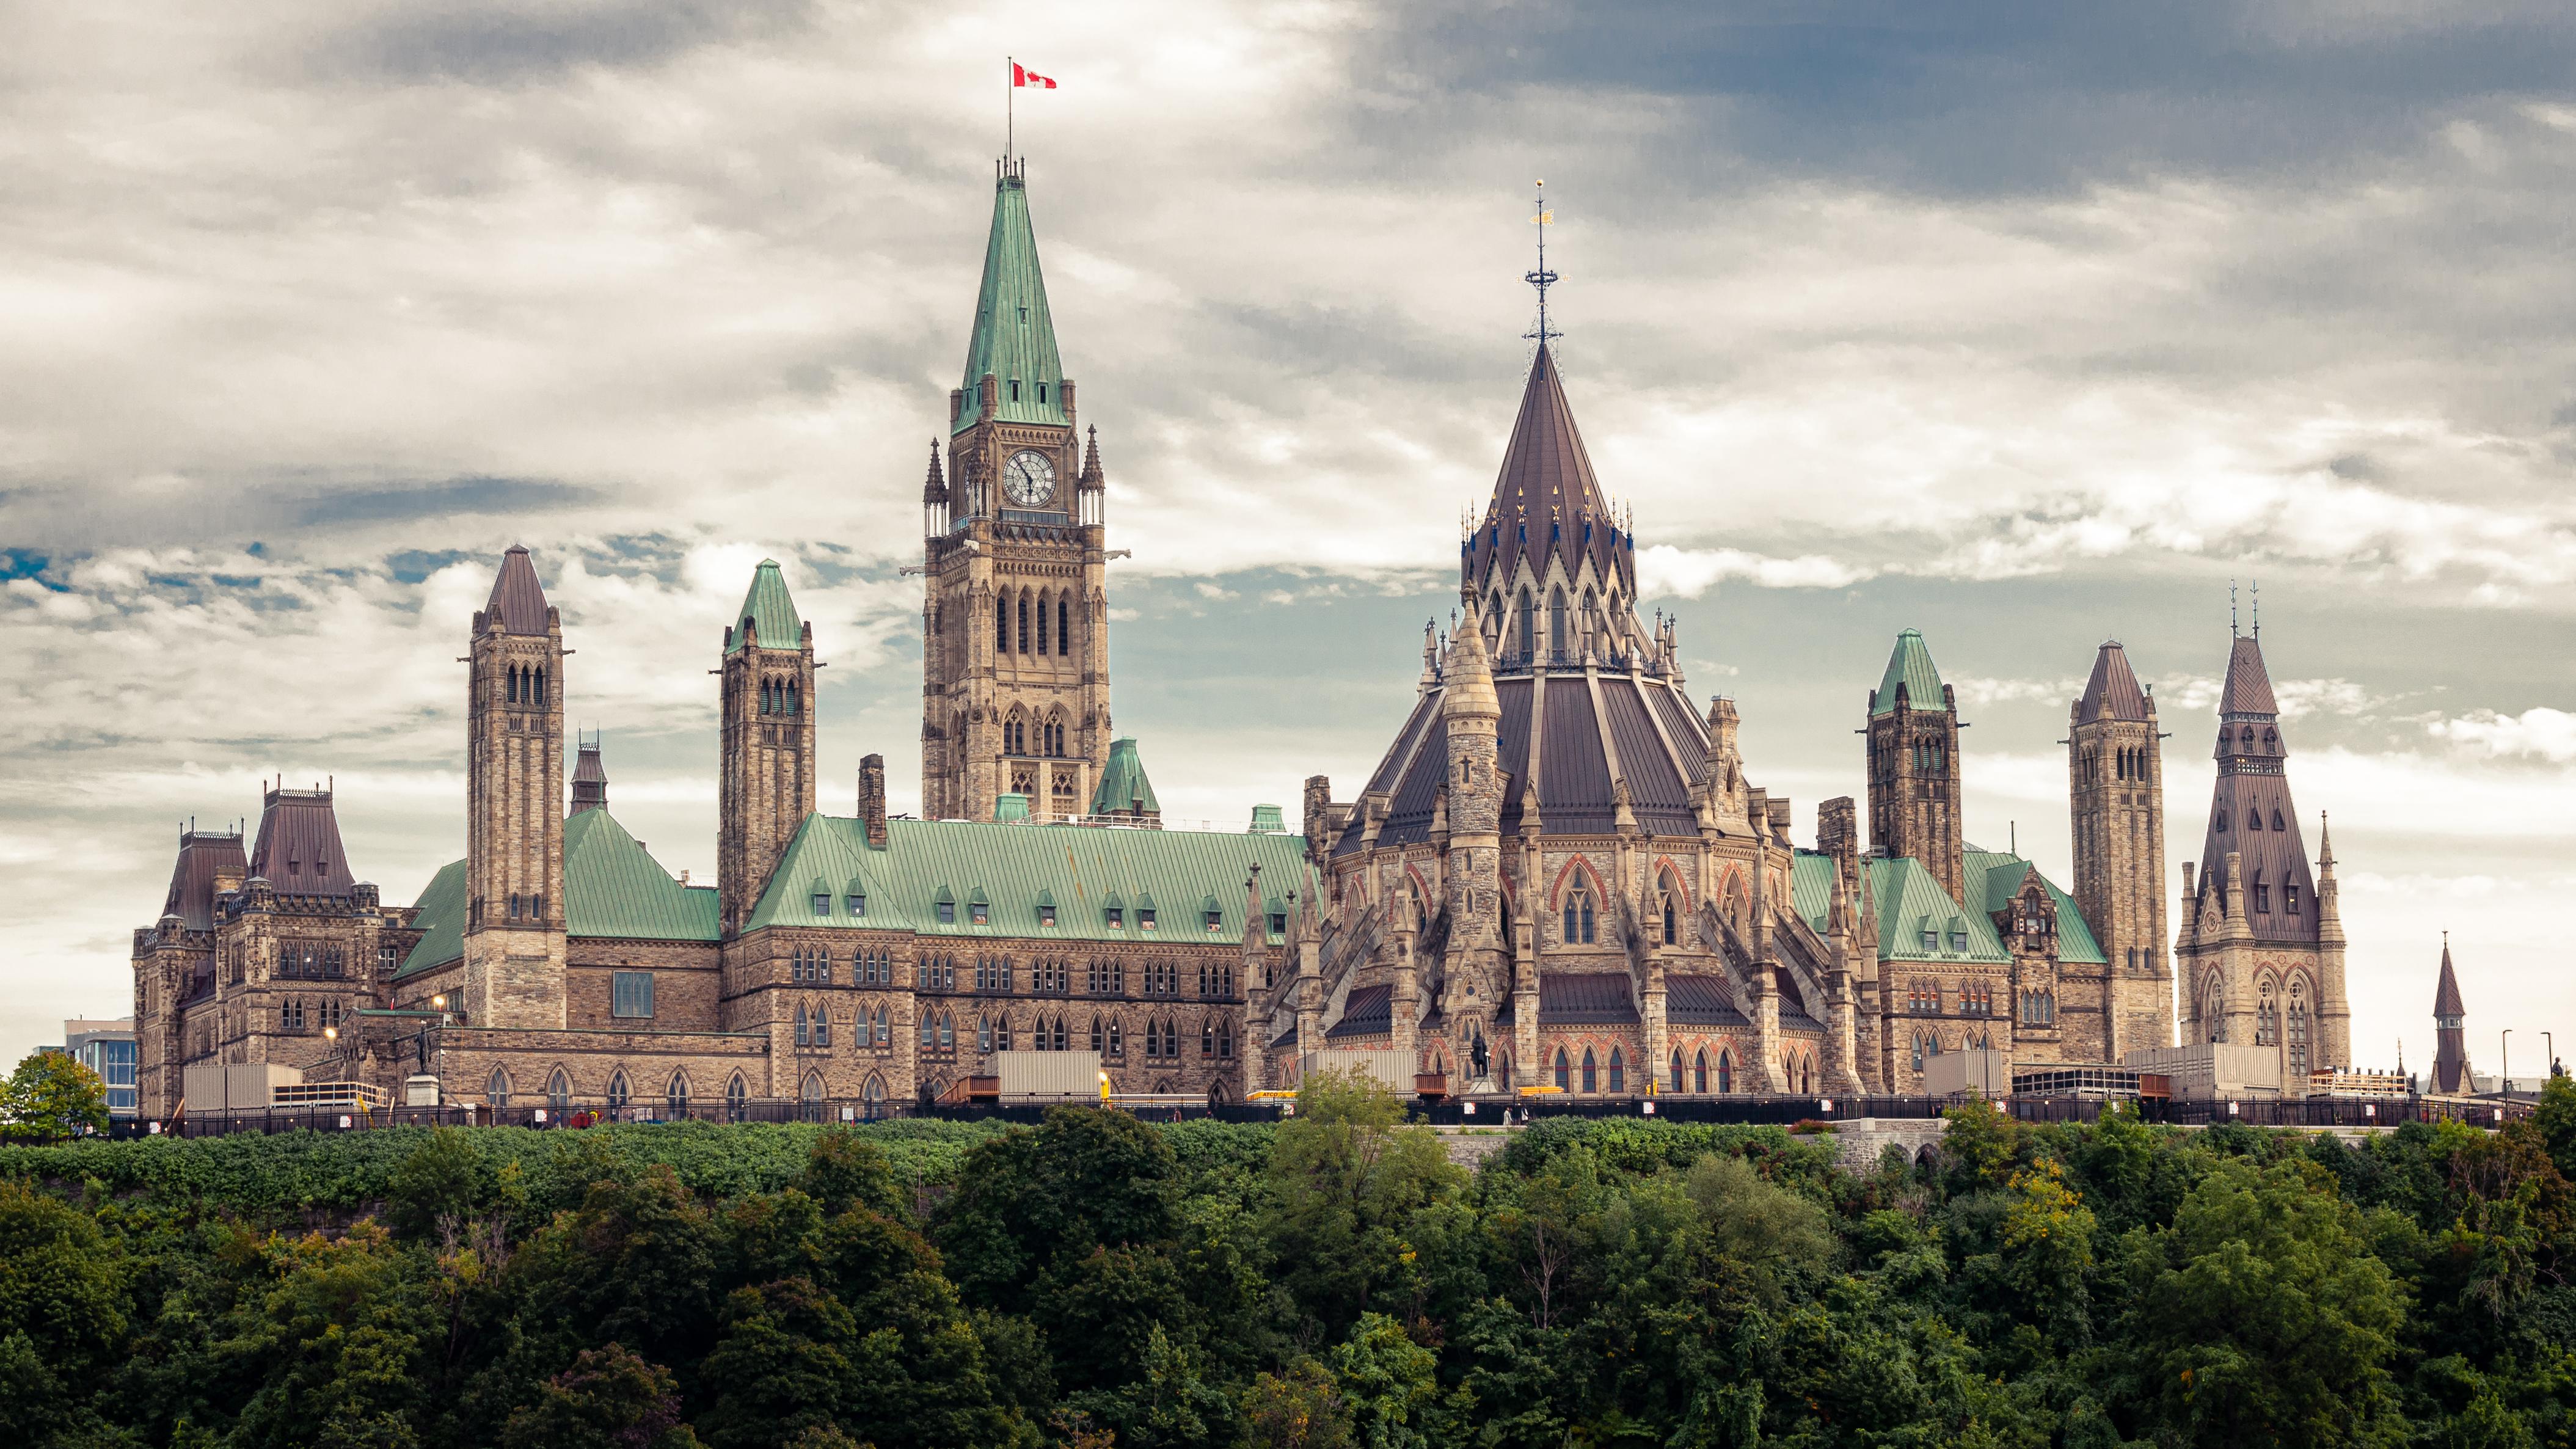 Вид на здание Парламента в Канаде, стране, куда можно переехать из стран СНГ